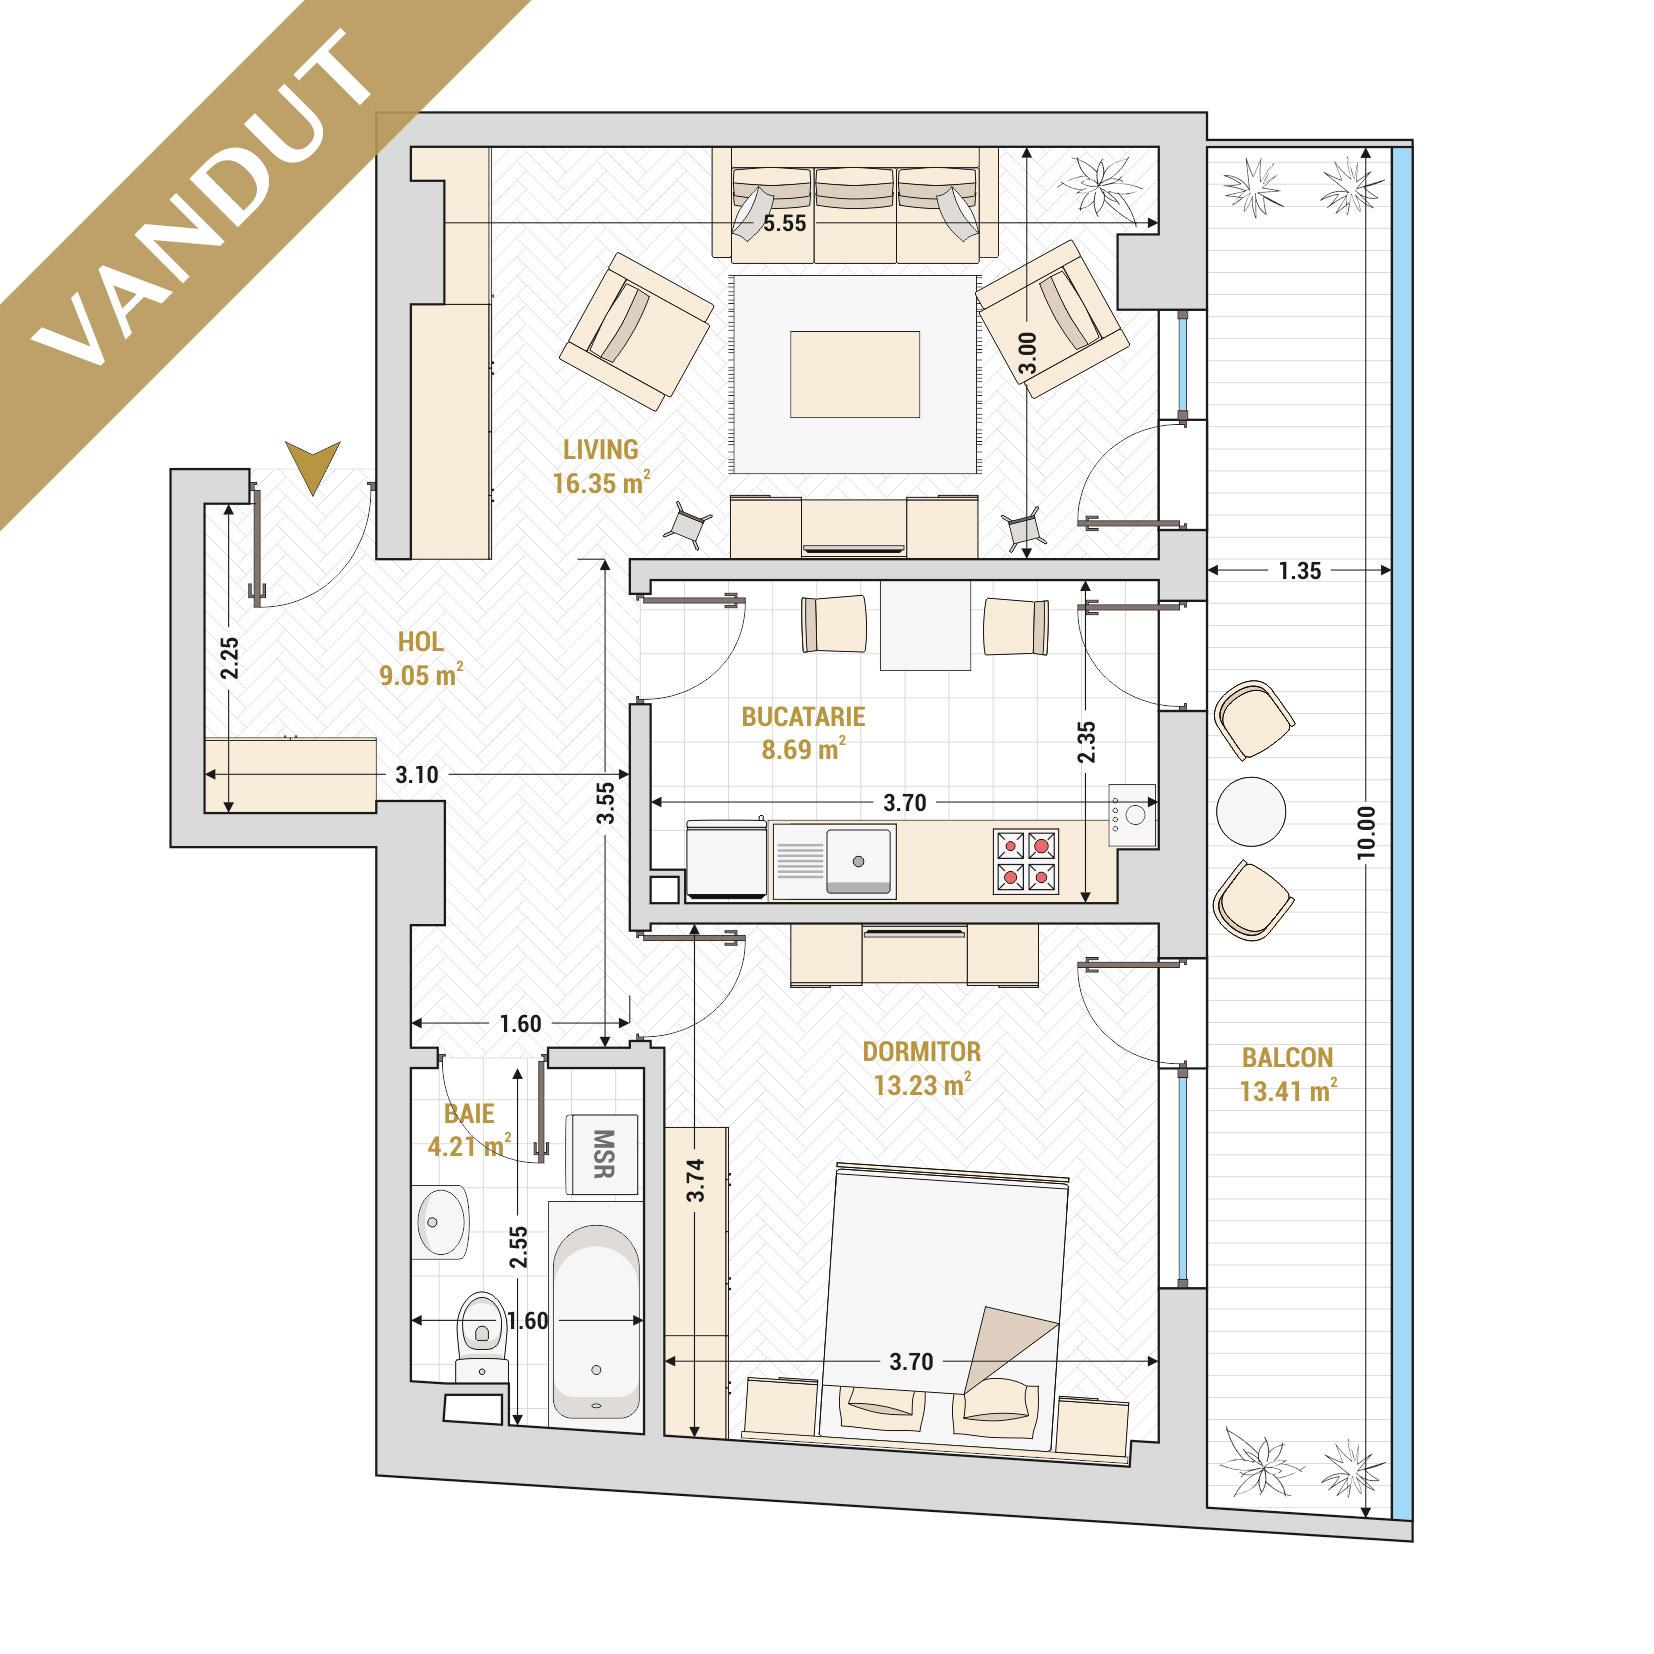 Apartament 2 camere de vanzare Bucuresti - Catedral Residence - Marriott, Piata Unirii, 13 Septembrie, Izvor - Tip 3 - T2A - V